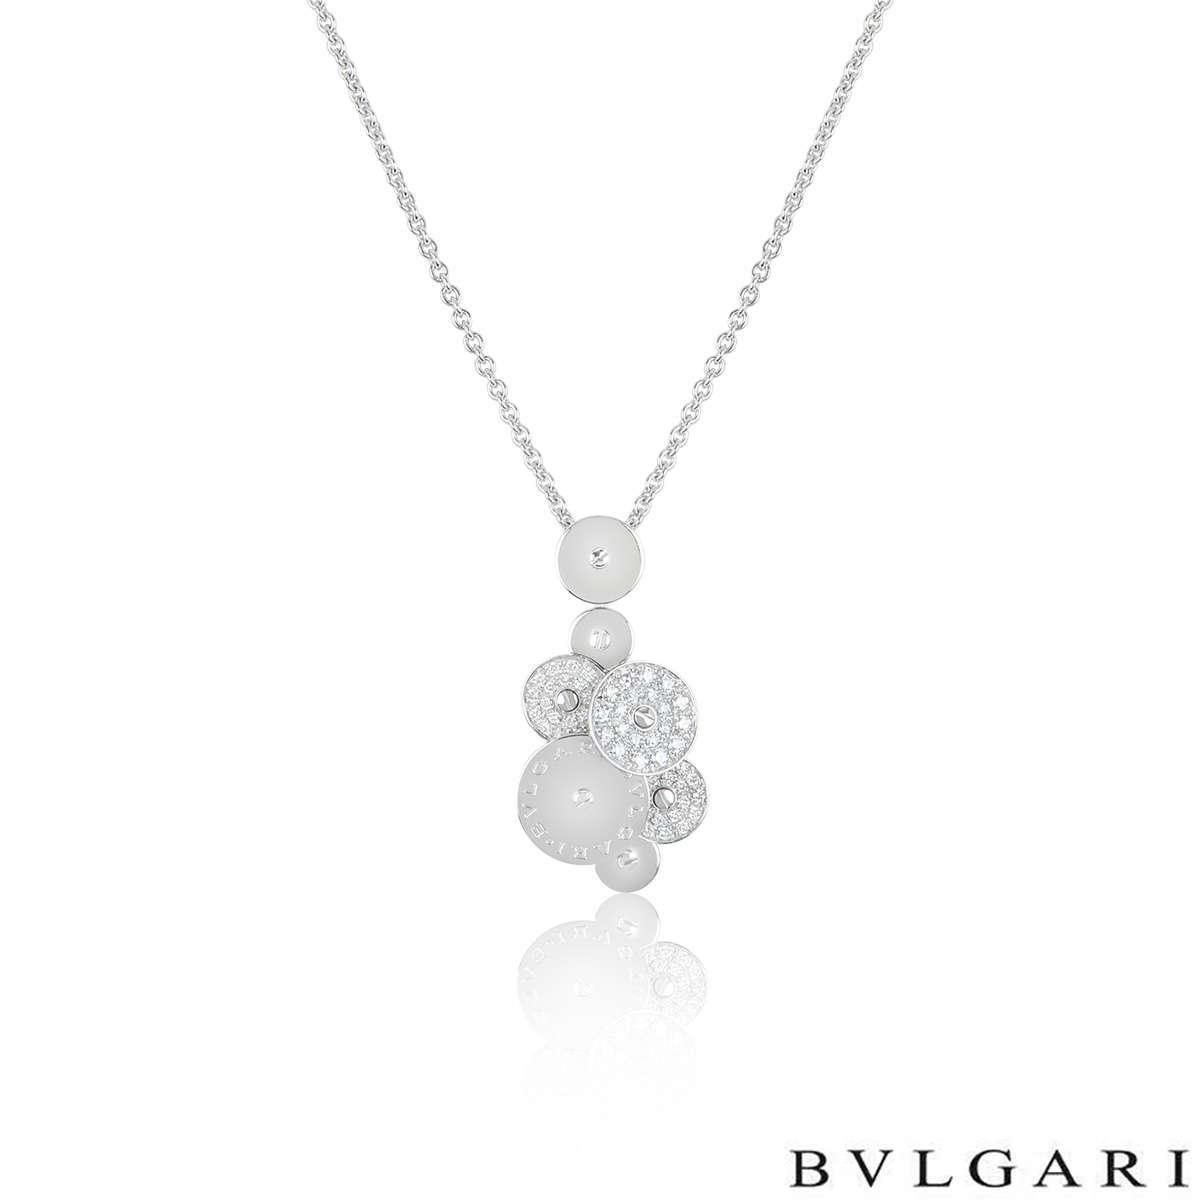 Bvlgari White Gold Diamond Cicladi Pendant